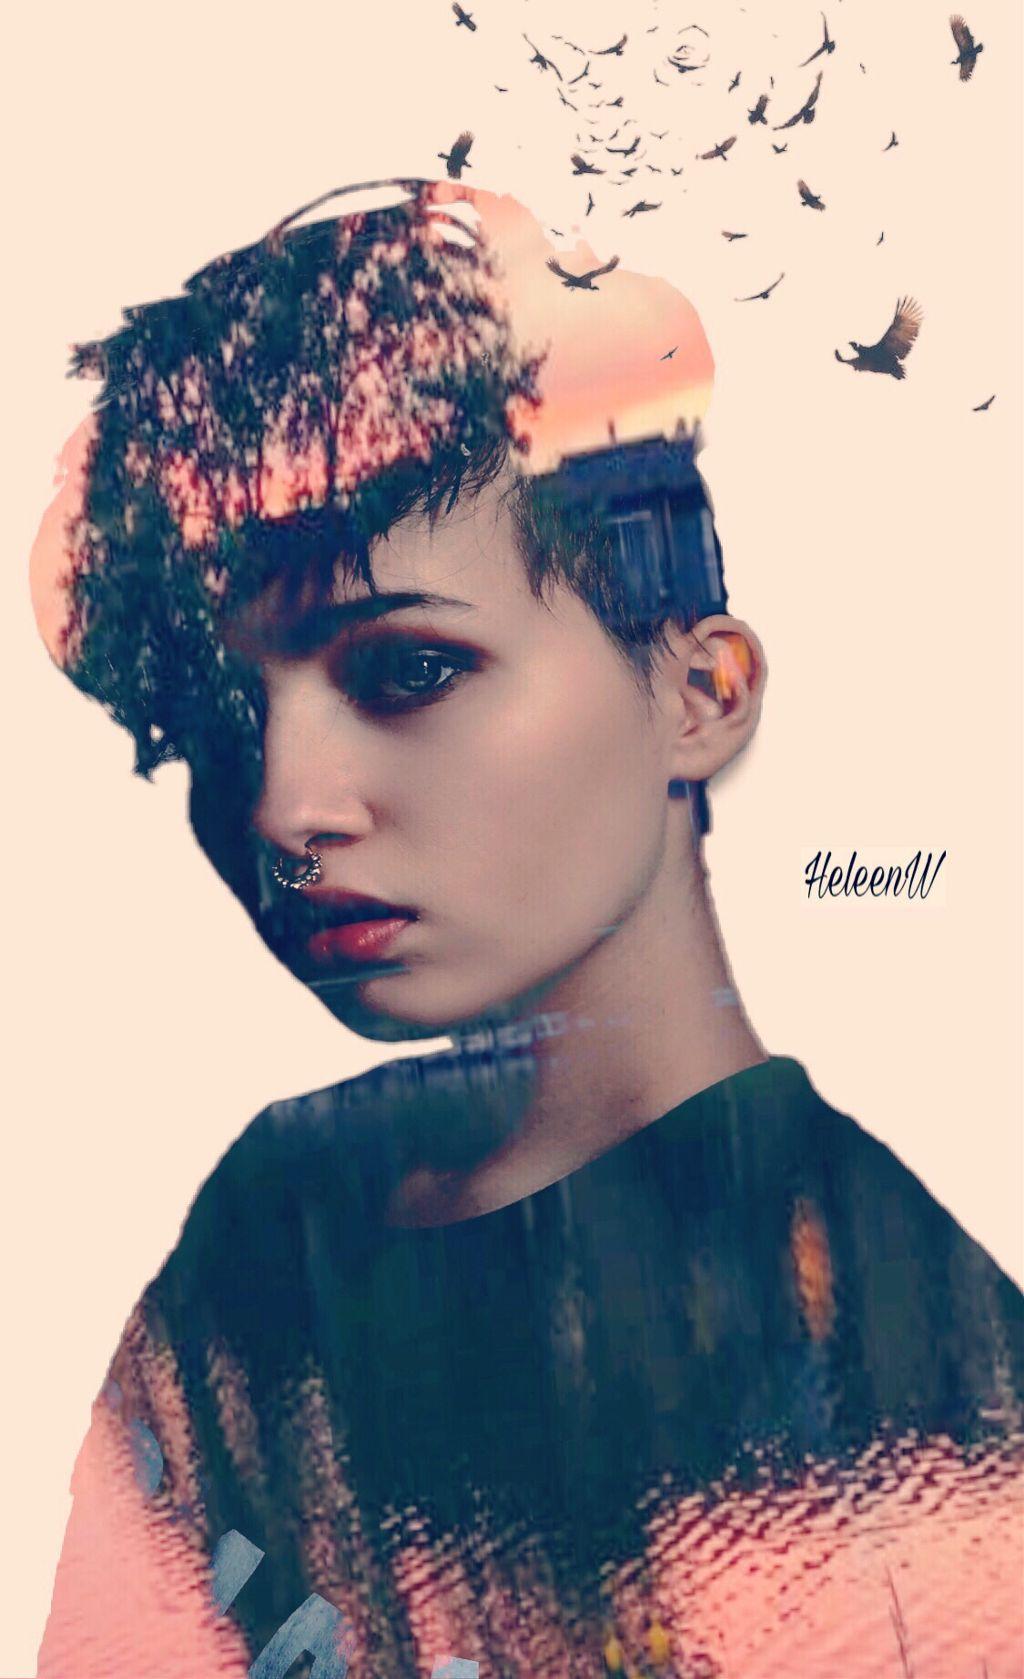 Colored lady #lady #colored #girl #doubleexposure #stickers #madewithpicsart #madebyme #myedit #mystyle #myart #freetoeditremix